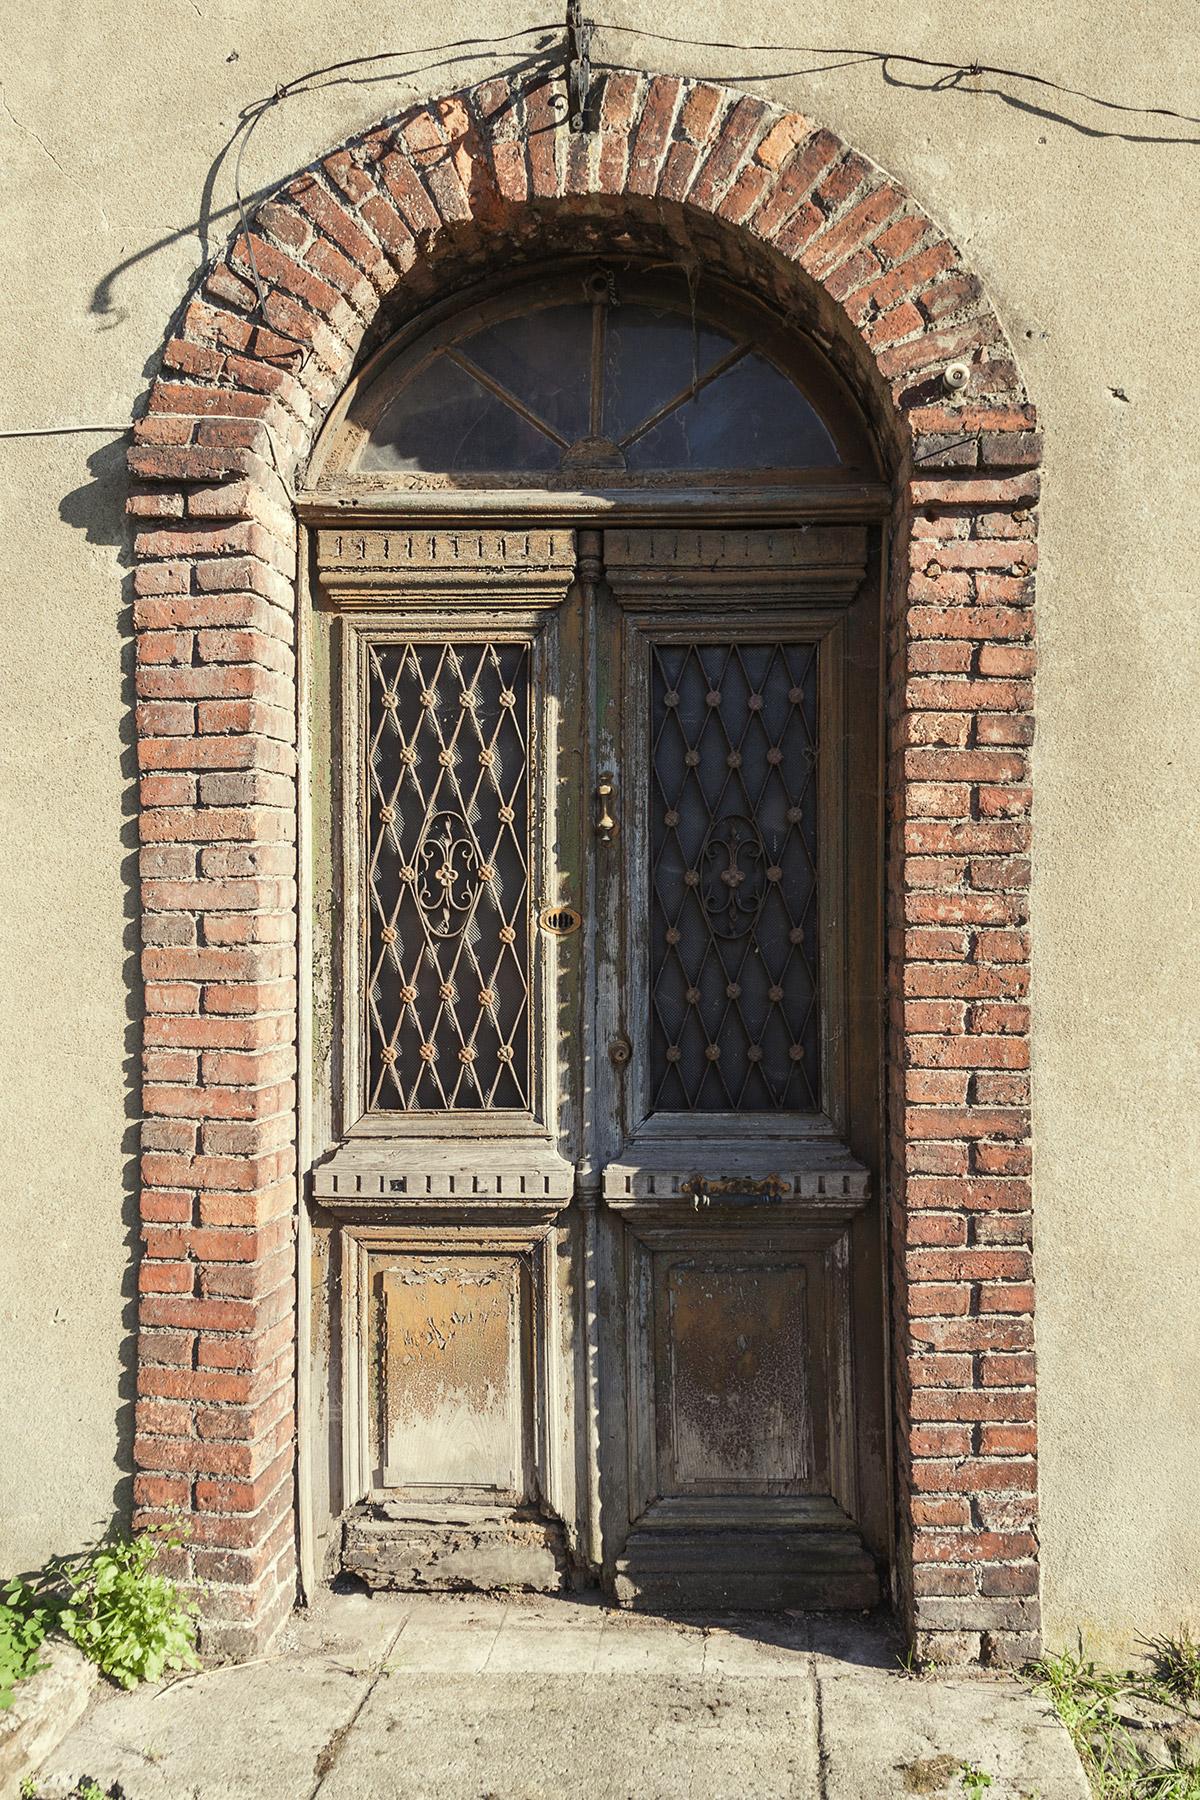 La Rebollada | Puerta | Autor: Mónica | AF Semeya